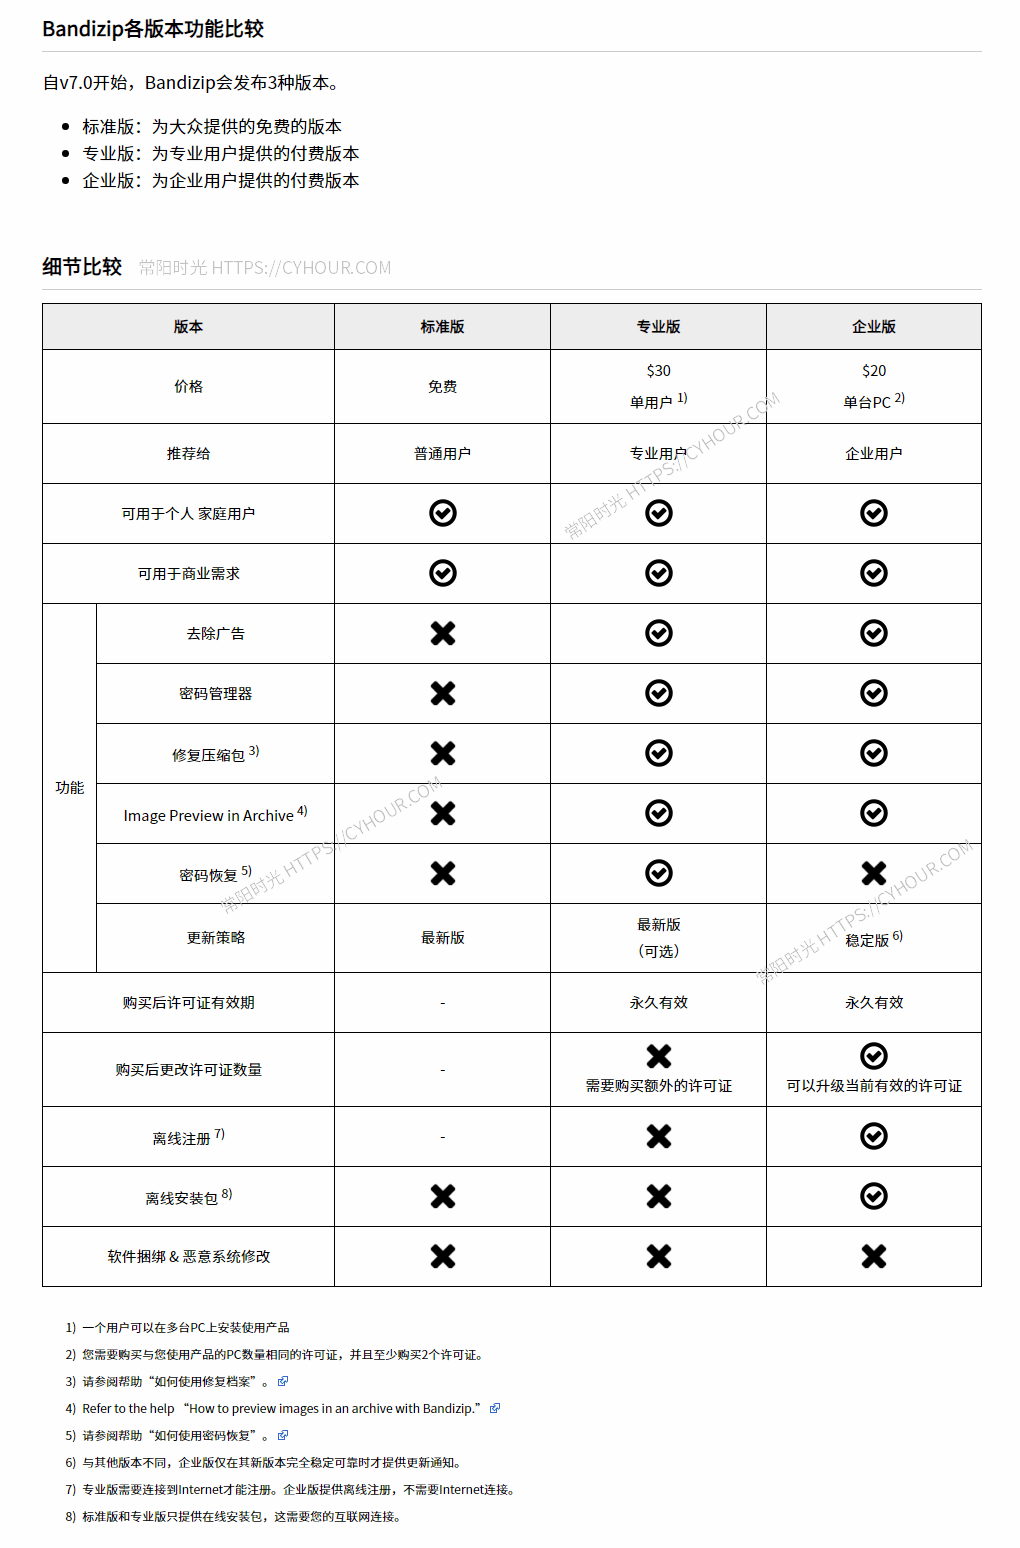 Bandizip – 优秀好用 免费无广告文件压缩/解压缩工具软件 (替代WinRAR与7Zip)-沙唐桔